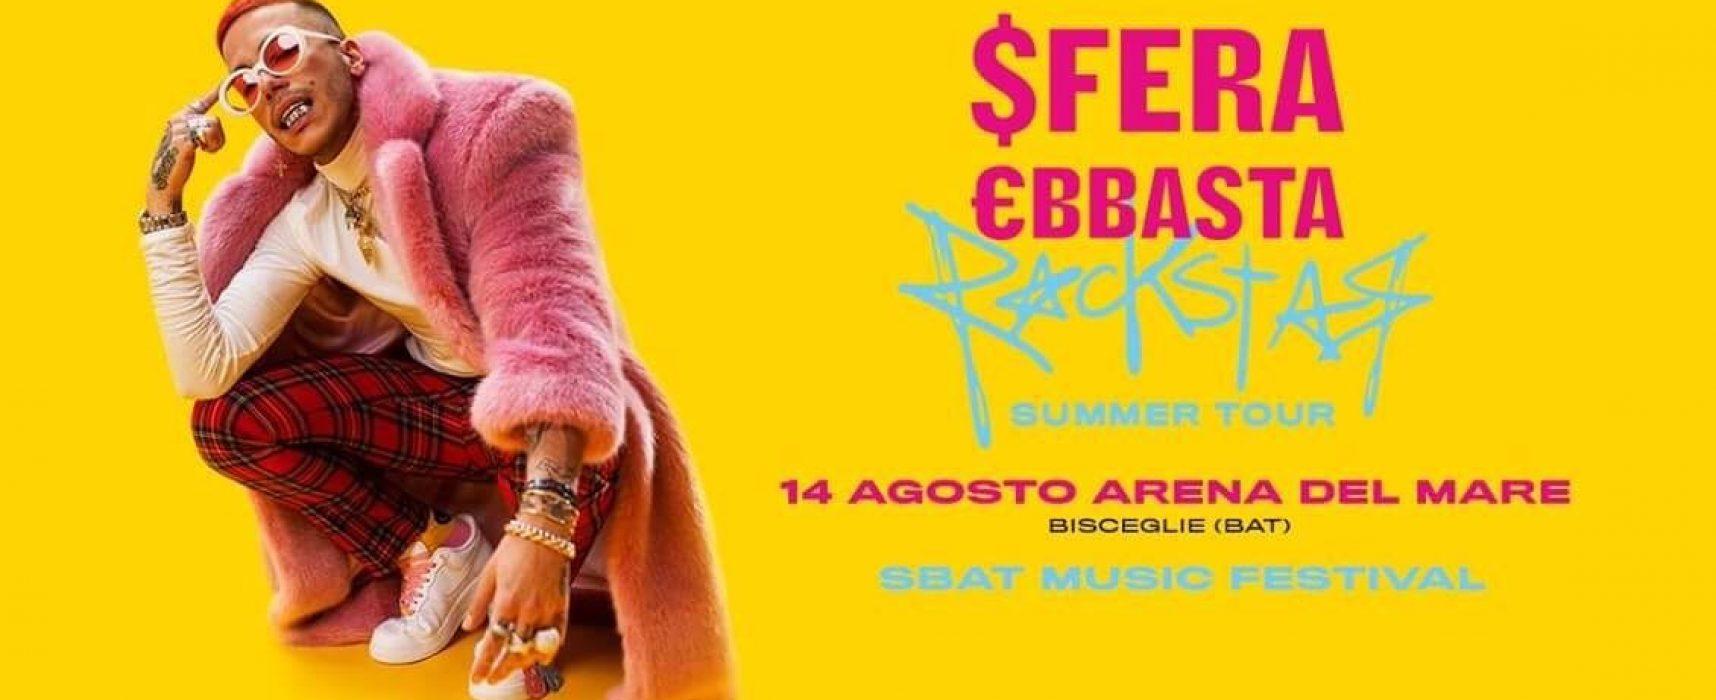 Sfera Ebbasta in concerto a Bisceglie questa estate, biglietti già in vendita